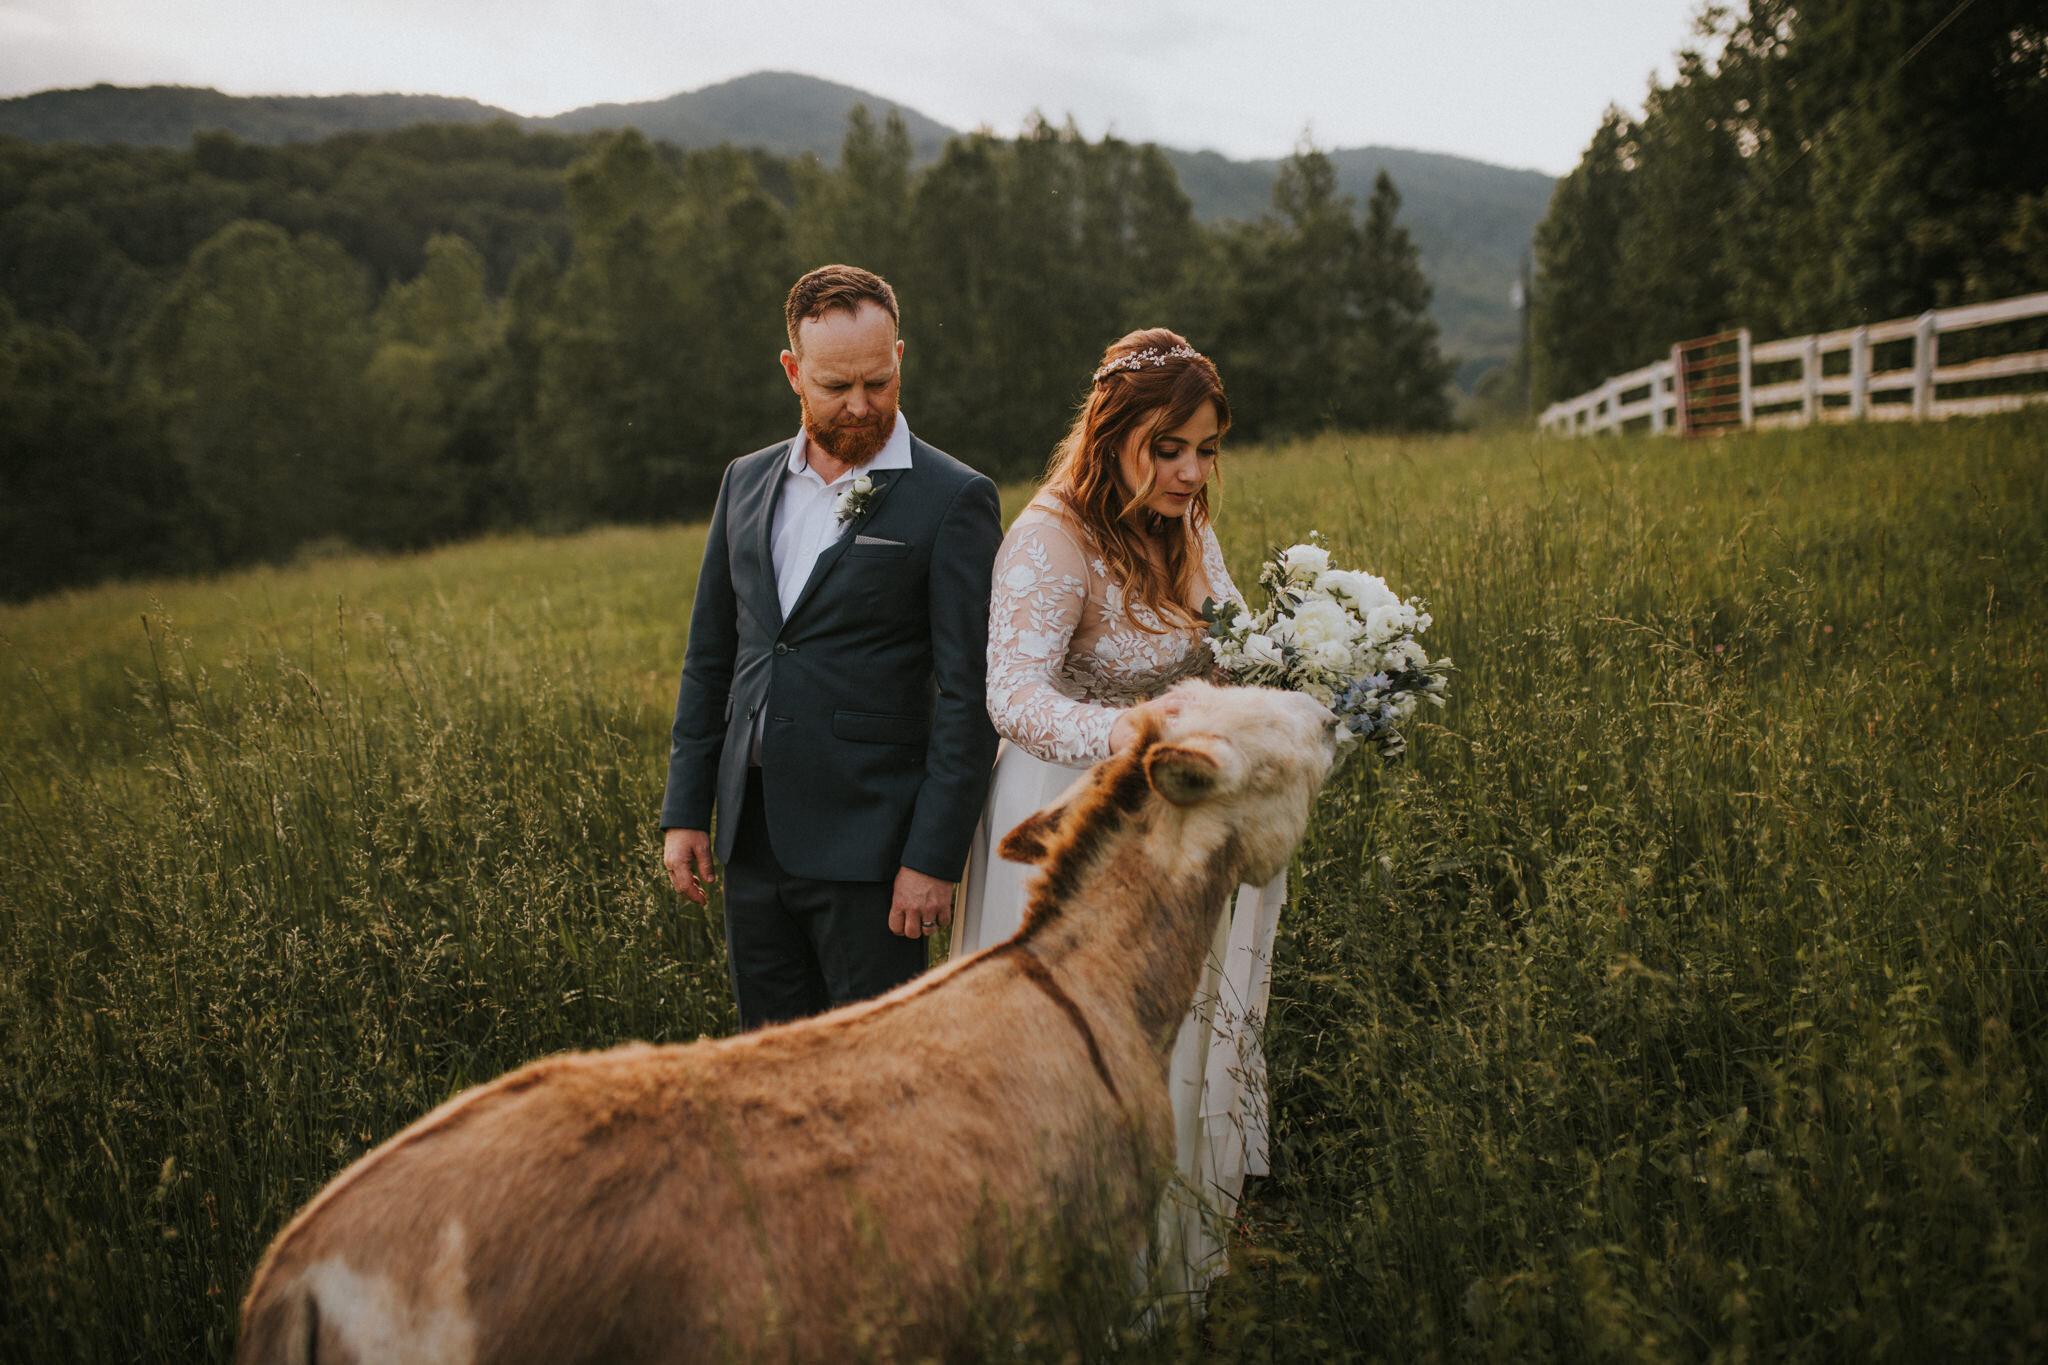 KateMatt-North-Georgia-Wedding-Photographer-Mountain-Laurel-Farm-168.jpg